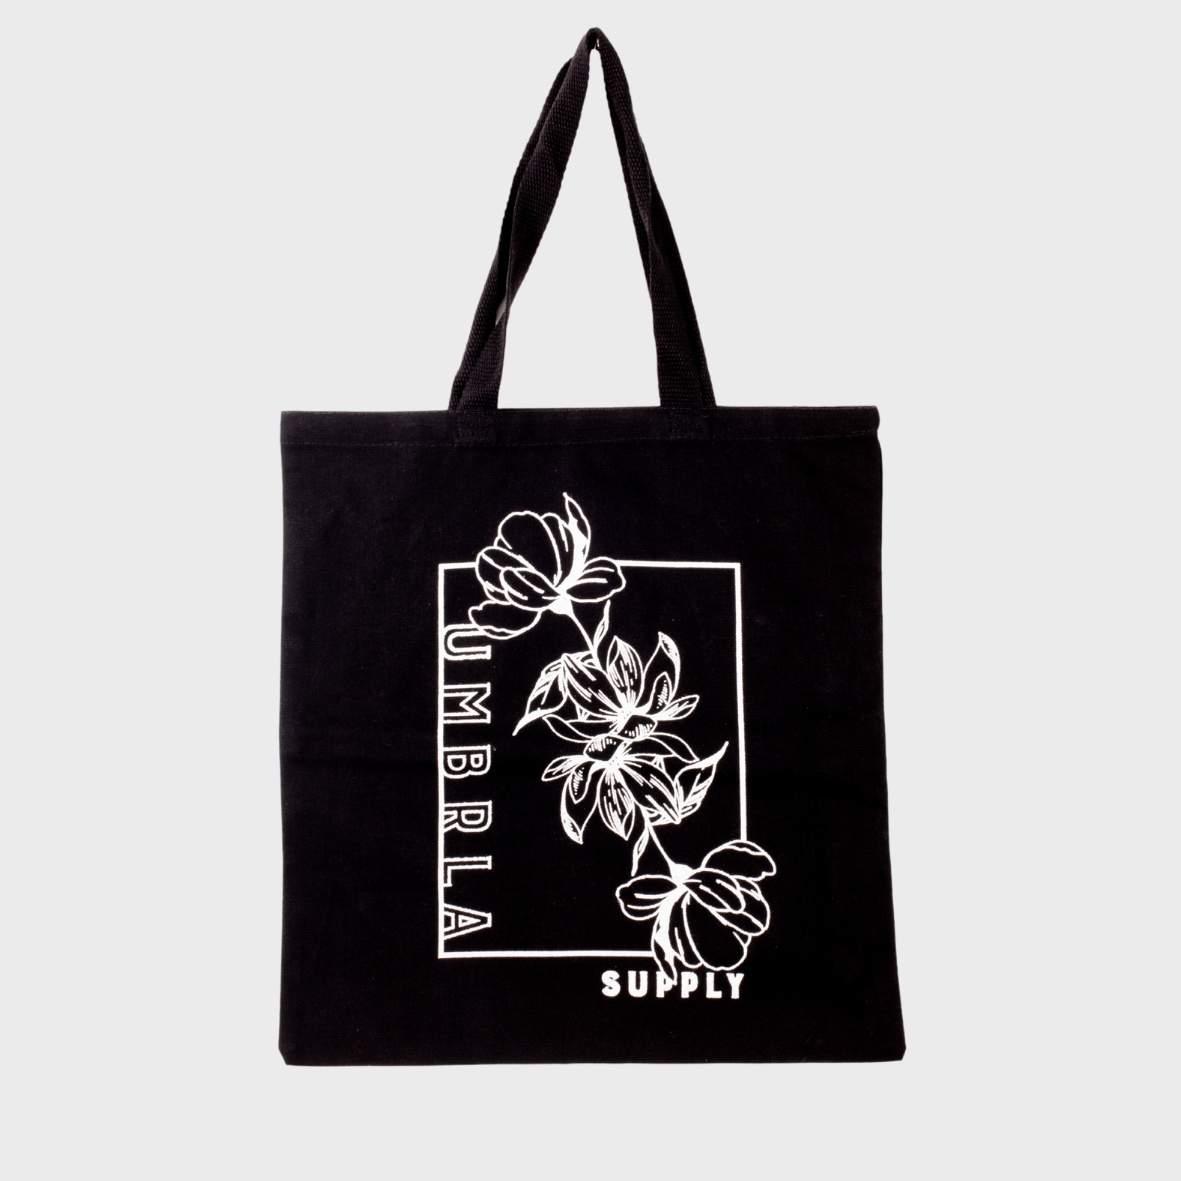 A tote bag with a custom printed design